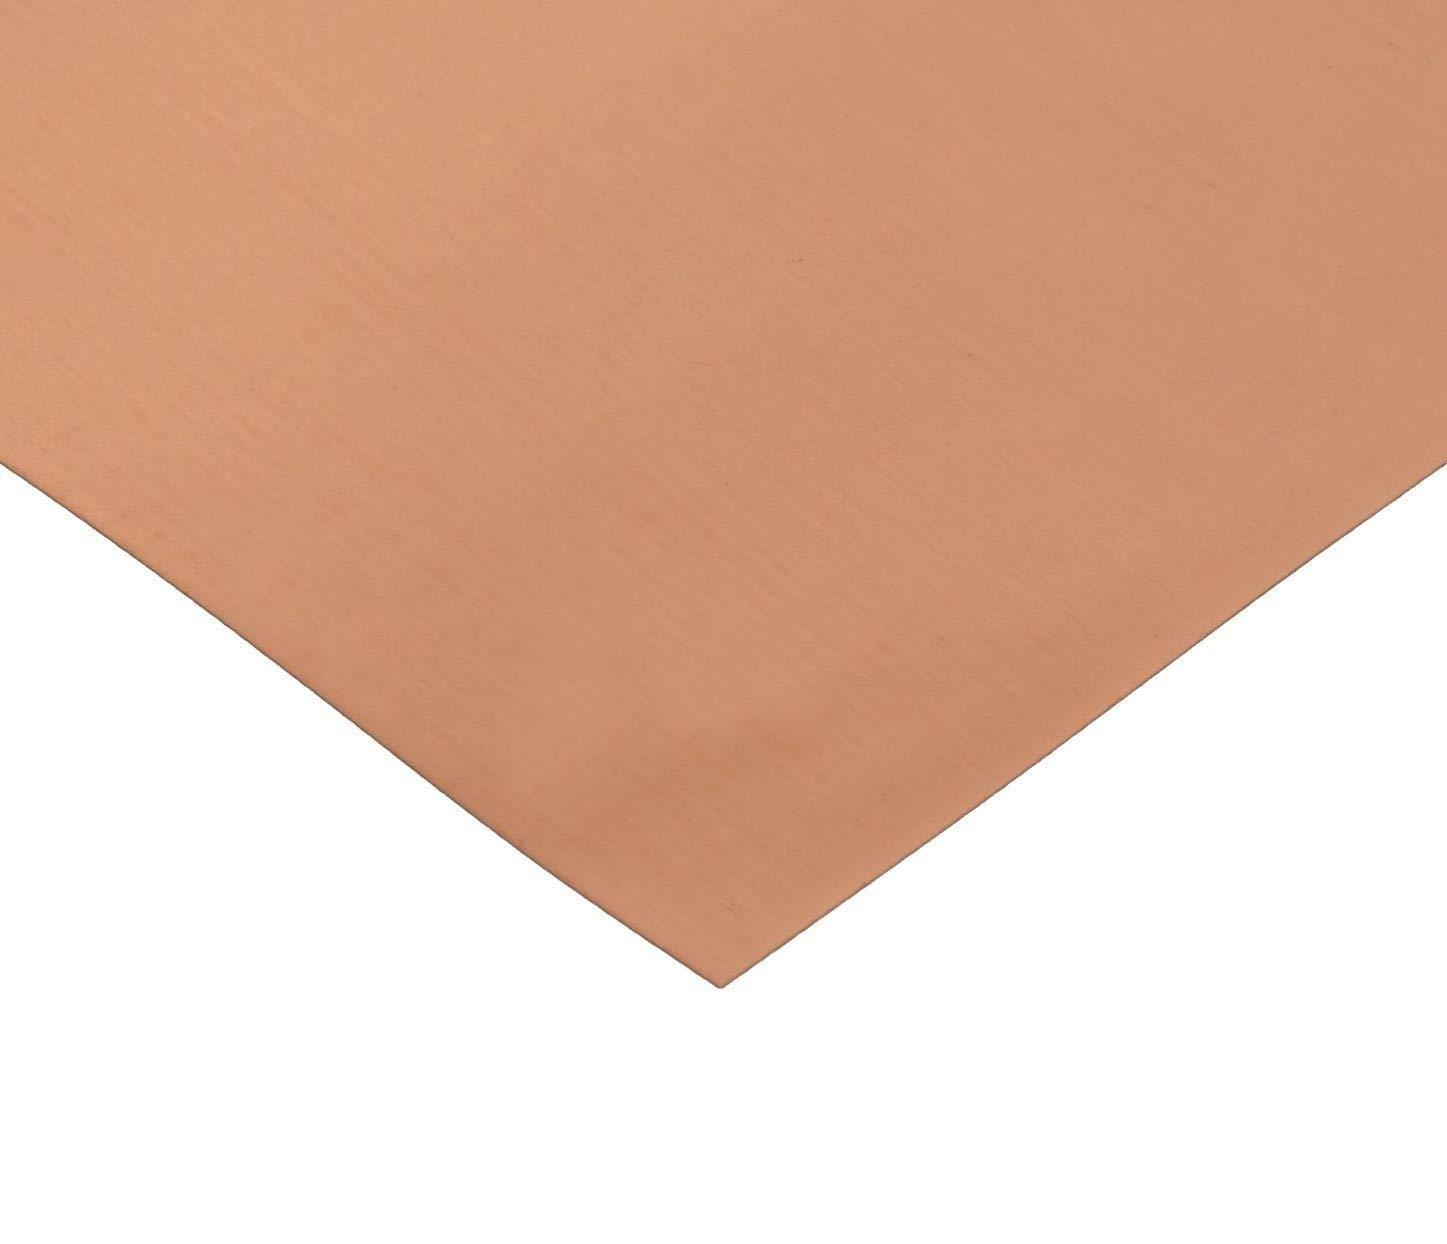 RMP 110 Copper Sheet, 8 Inch x 10 Inch x 0.021 Inch Thick